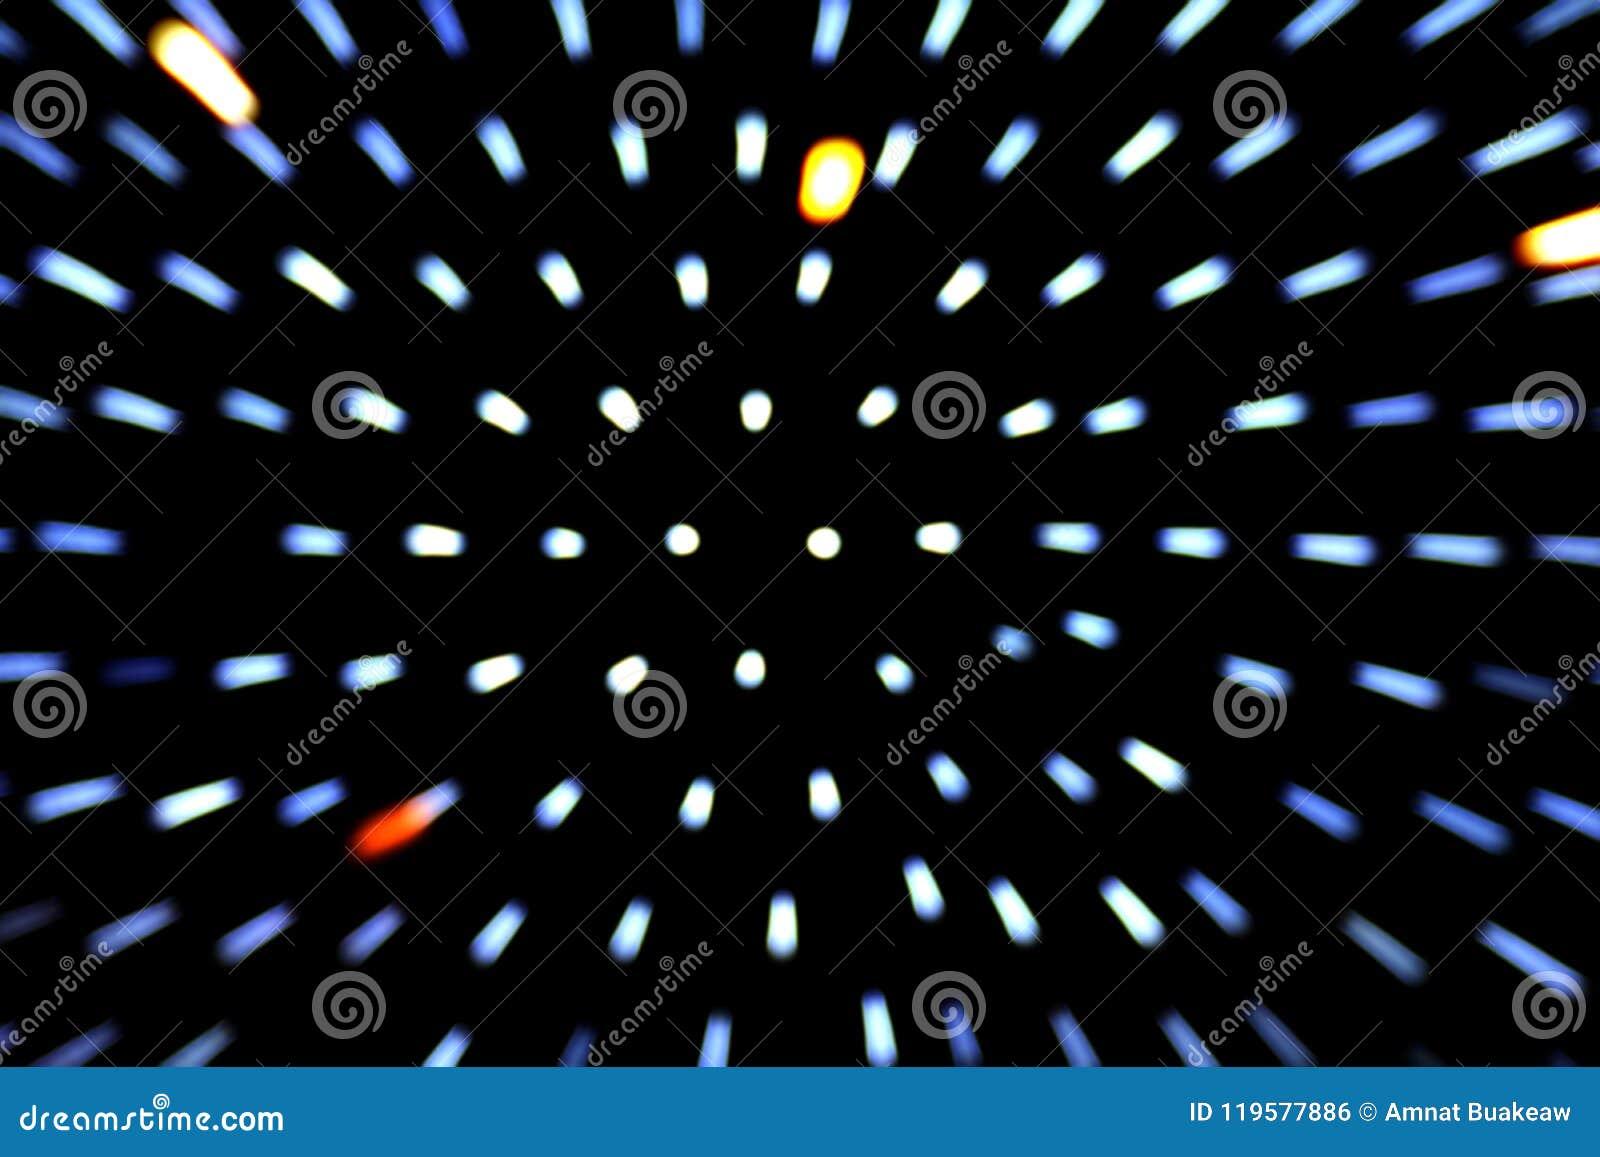 Zoom effect beam lighting bokeh movement blurred on dark black background